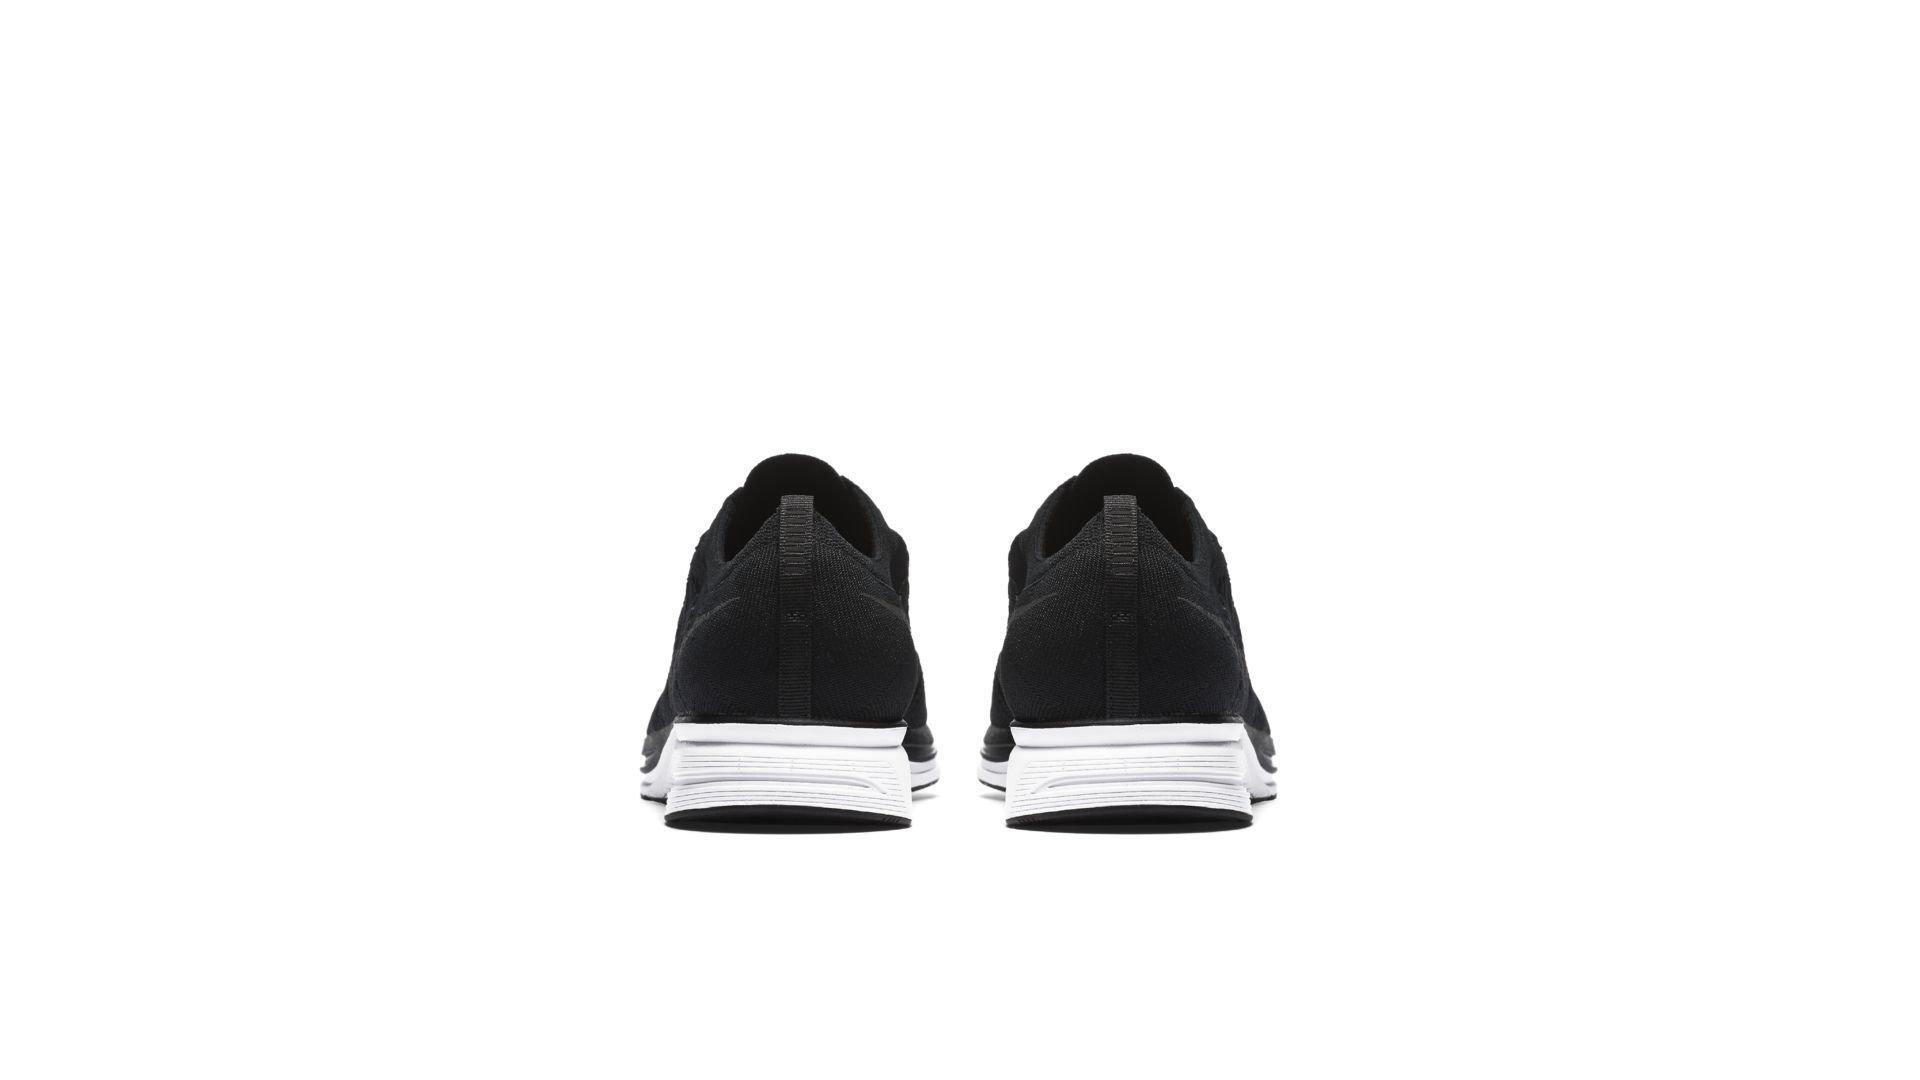 Nike Flyknit Trainer Black White (2018) (AH8396-007)